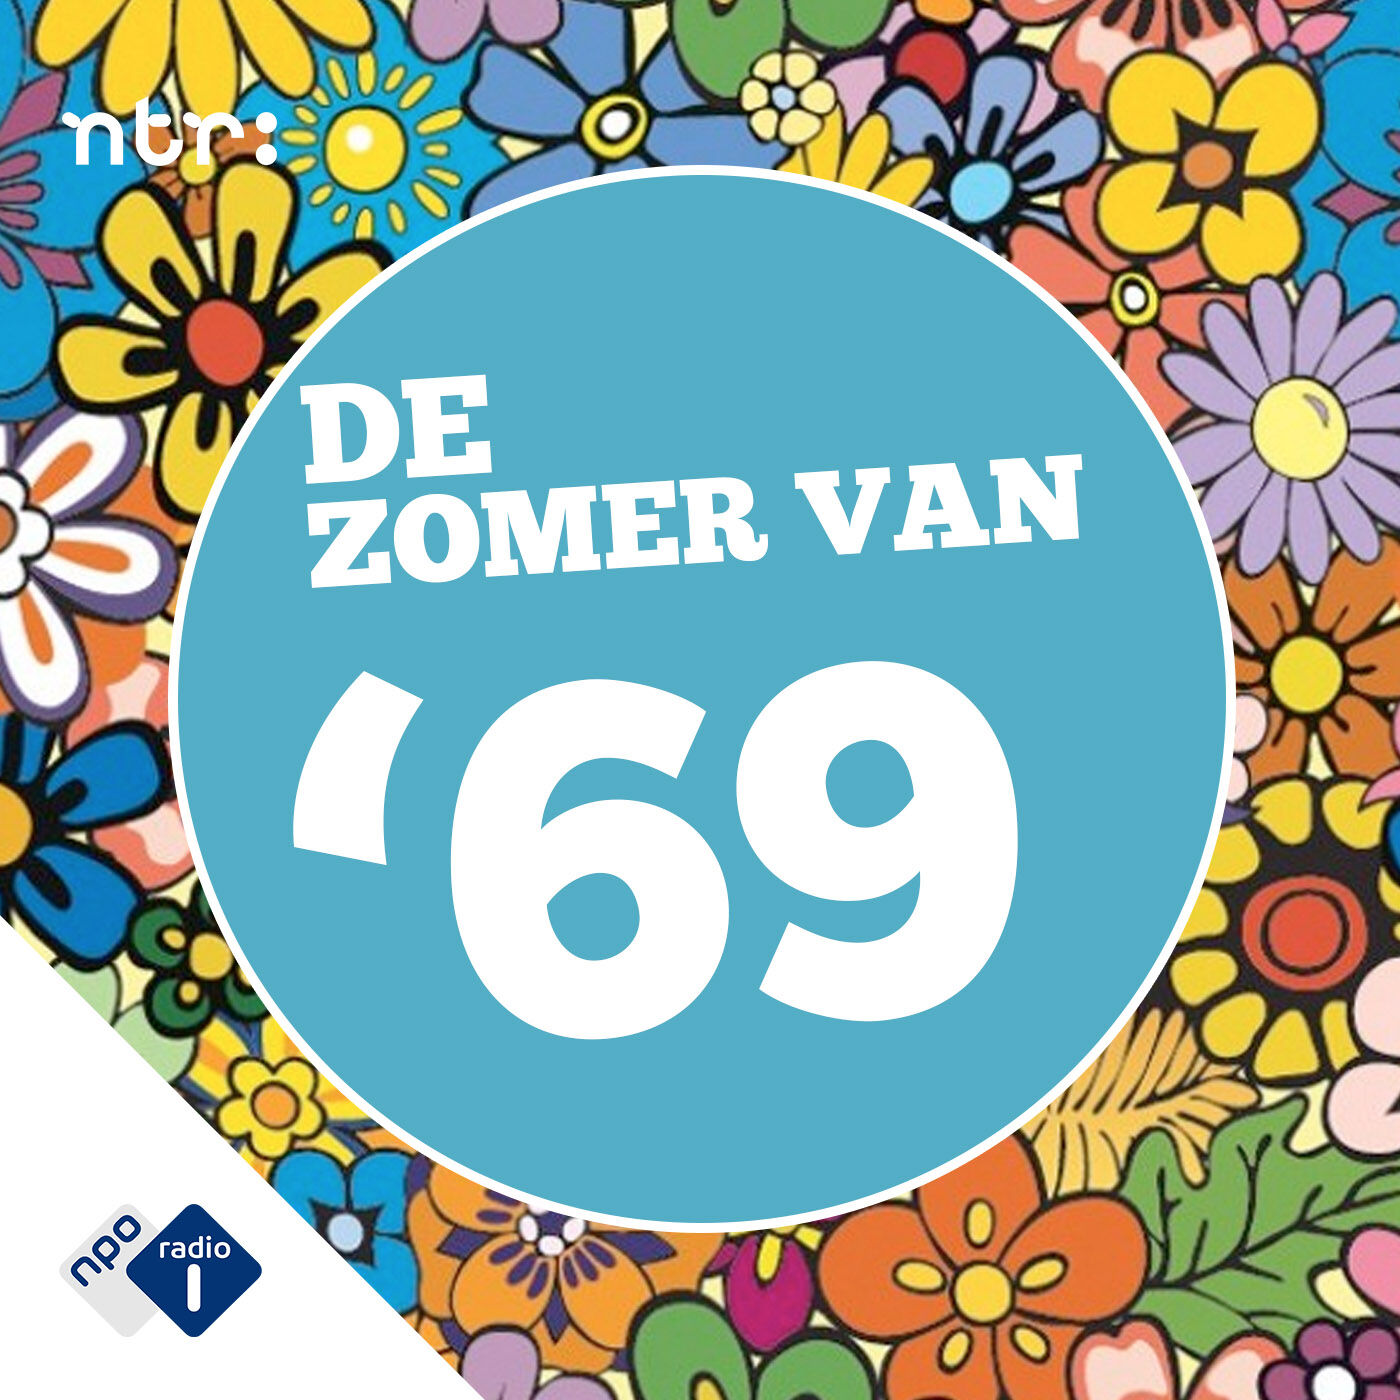 De zomer van '69 logo